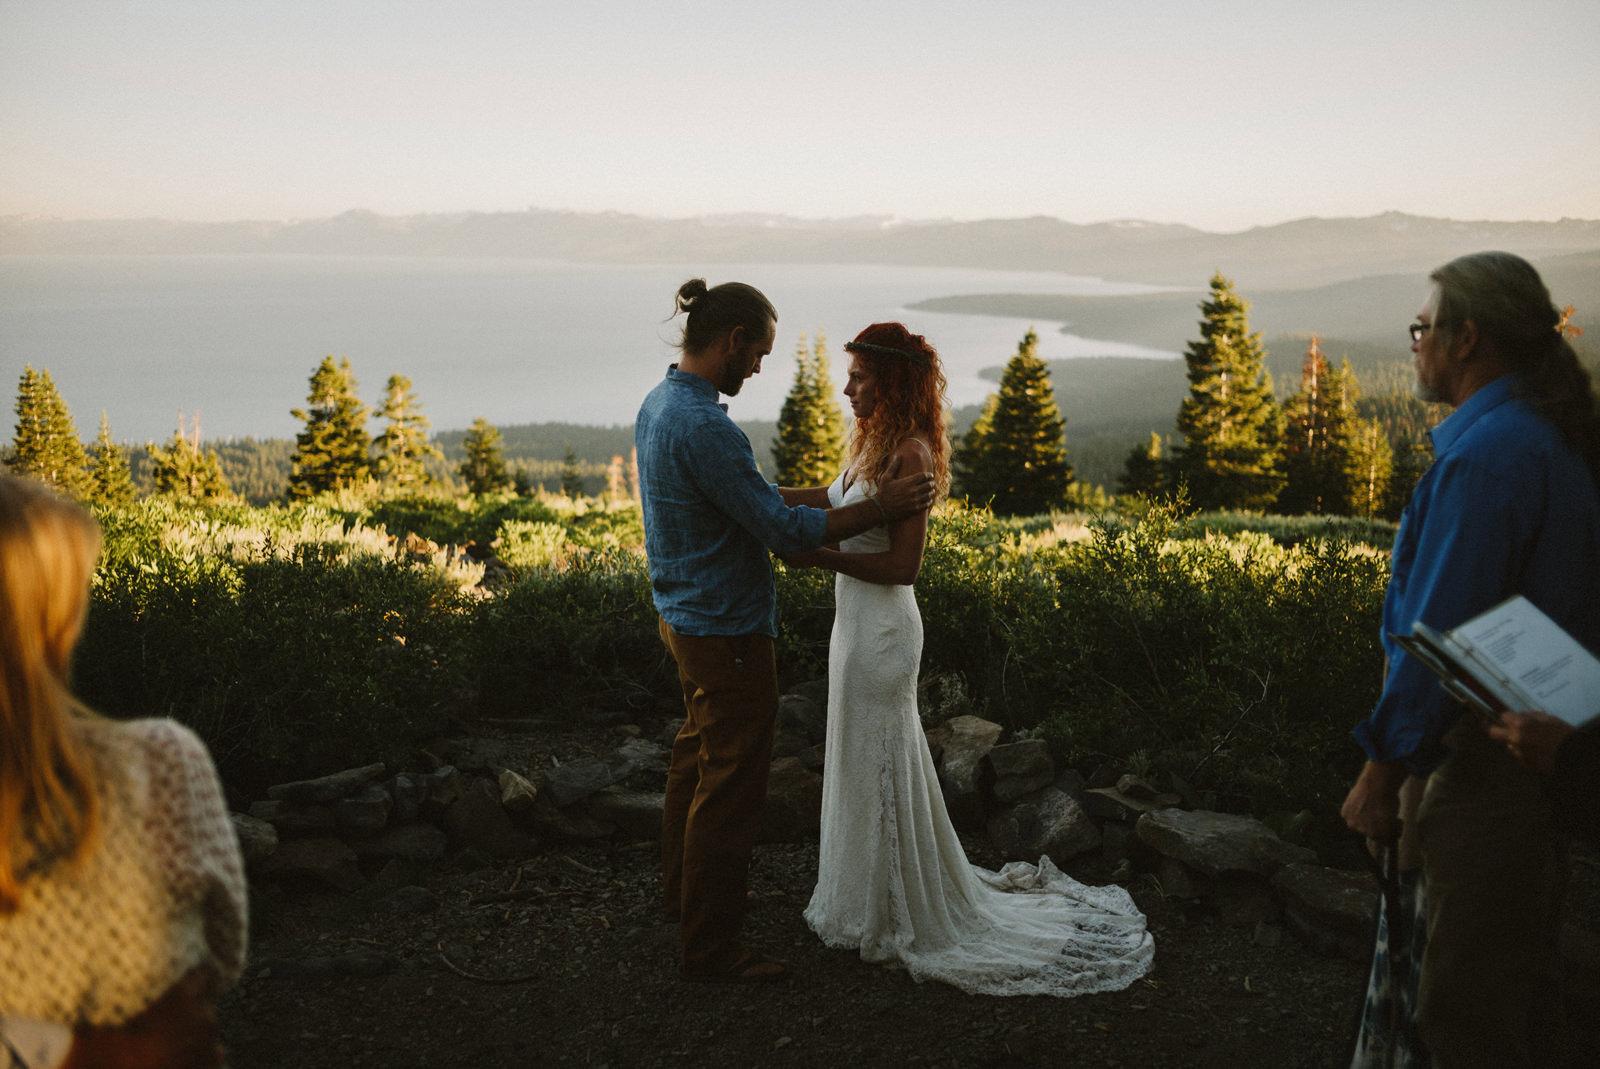 lake-tahoe-elopement-087 LAKE TAHOE ELOPEMENT